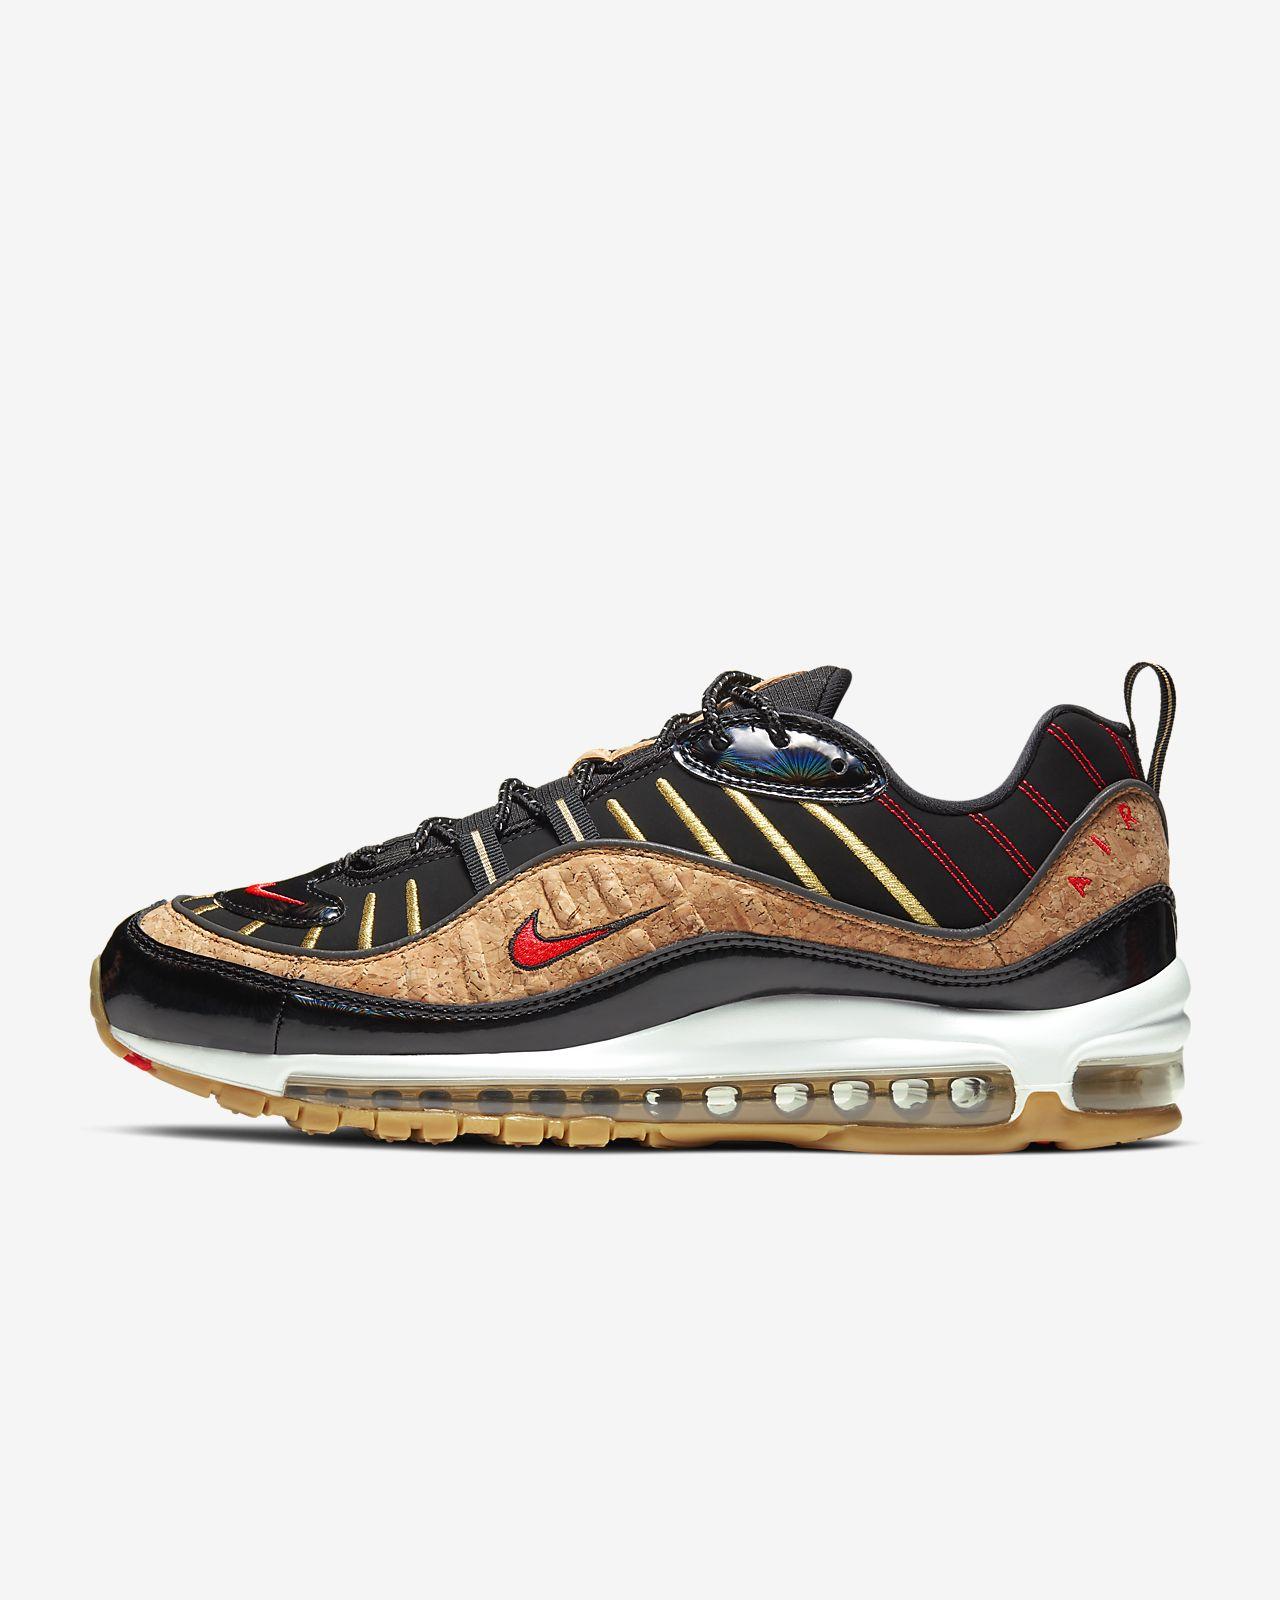 Nike Air Max 98 Off White Grey Black Red Sneakers Men's